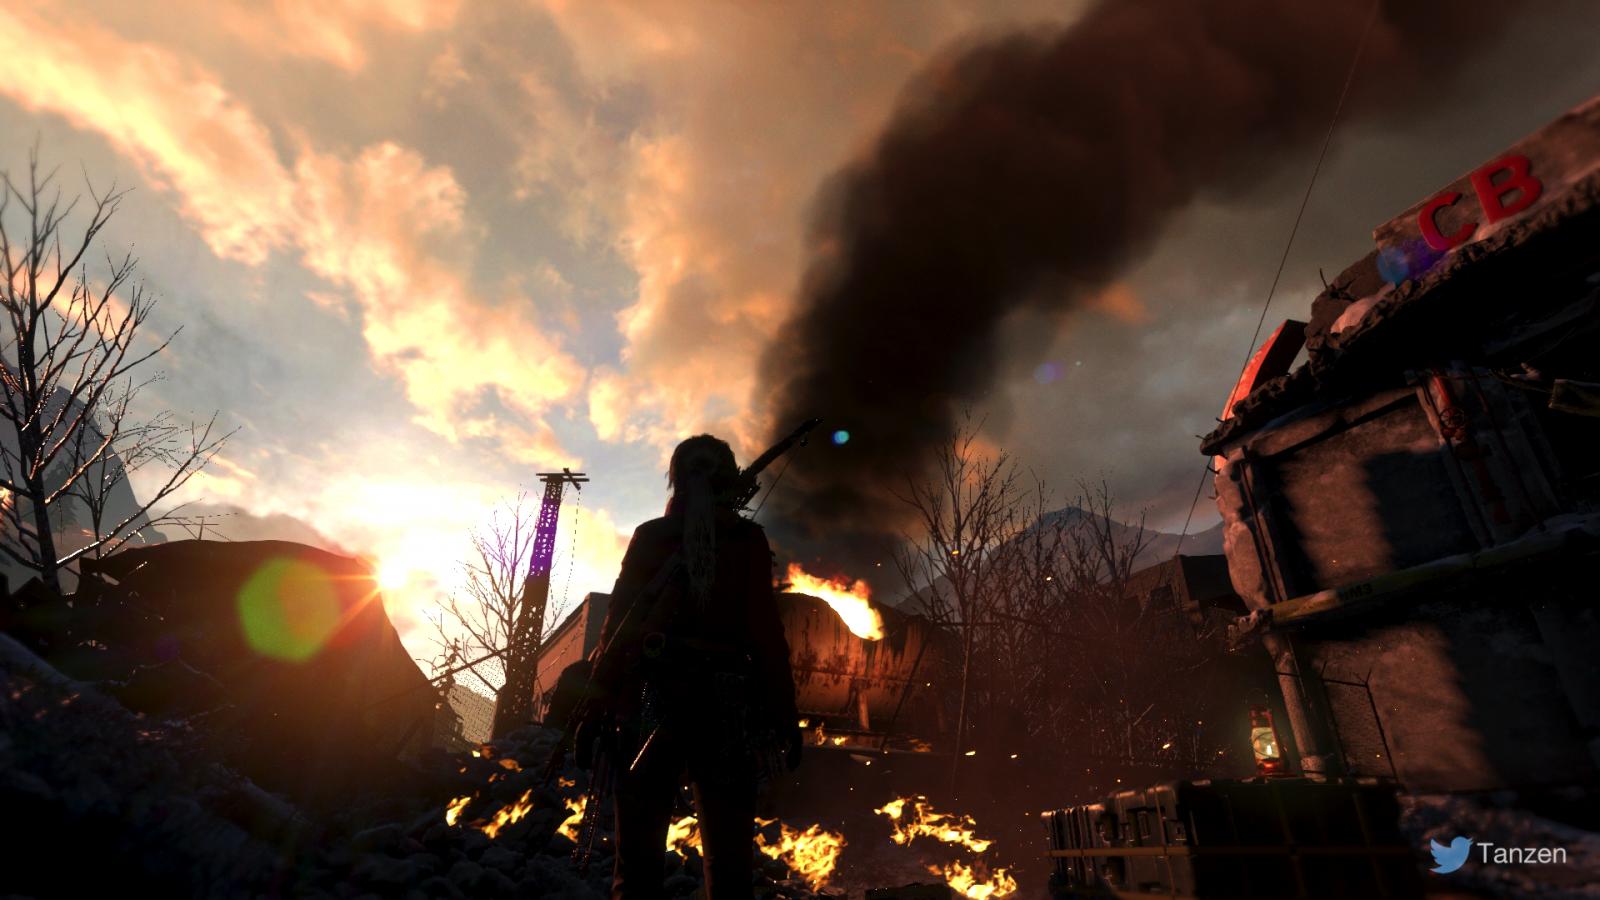 Rise of the Tomb Raider Screen Shot 09.11.15 20. 15_watermark